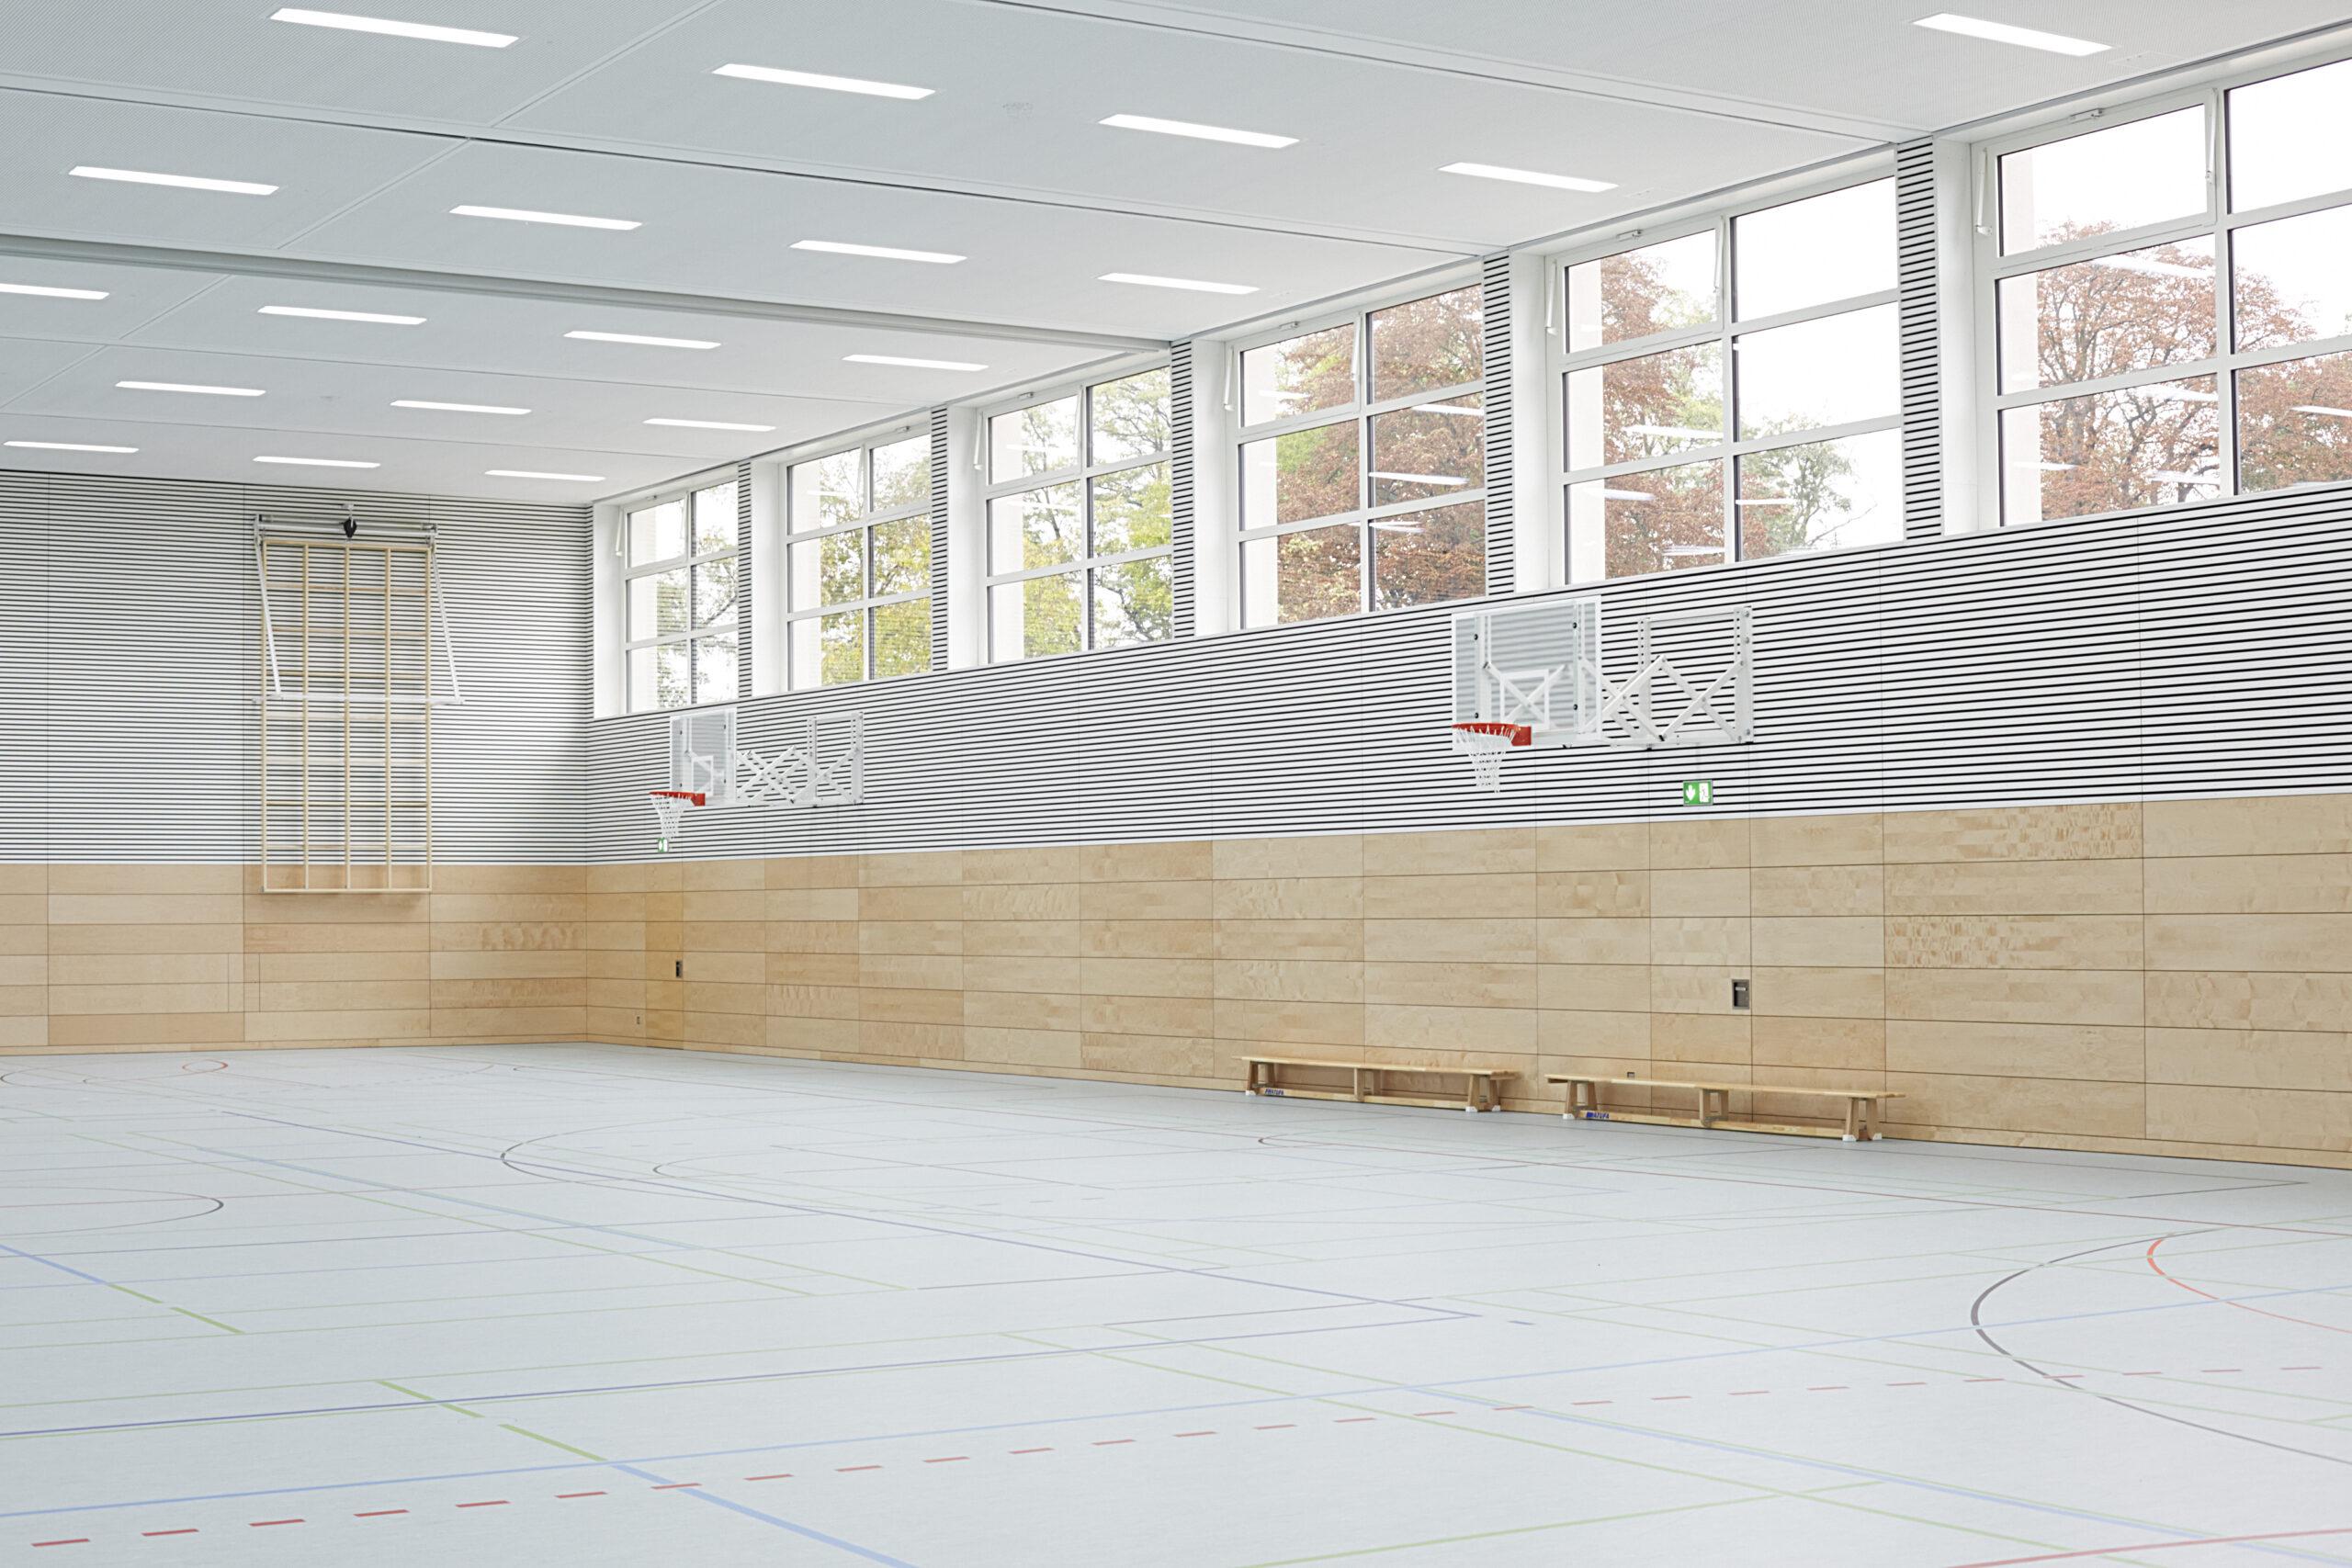 05 Sporthalle